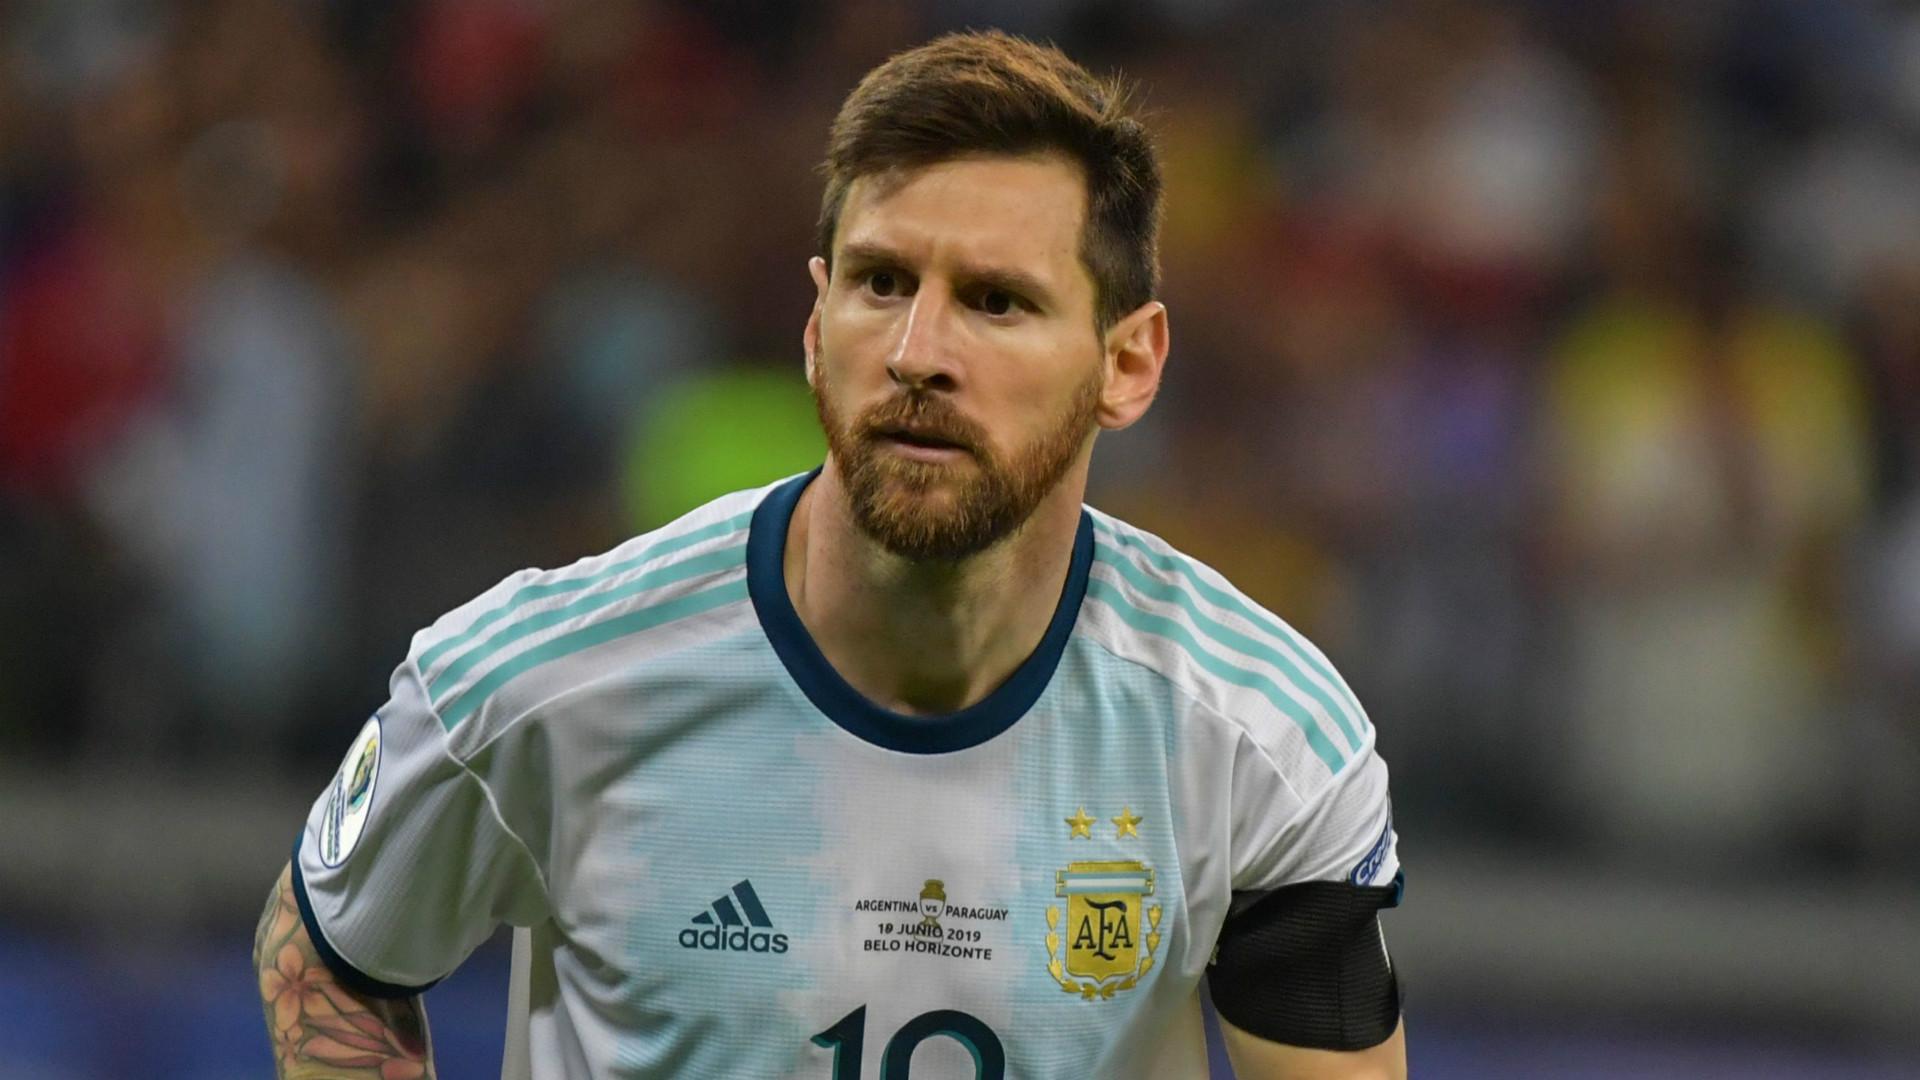 LIVE: Qatar vs Argentina